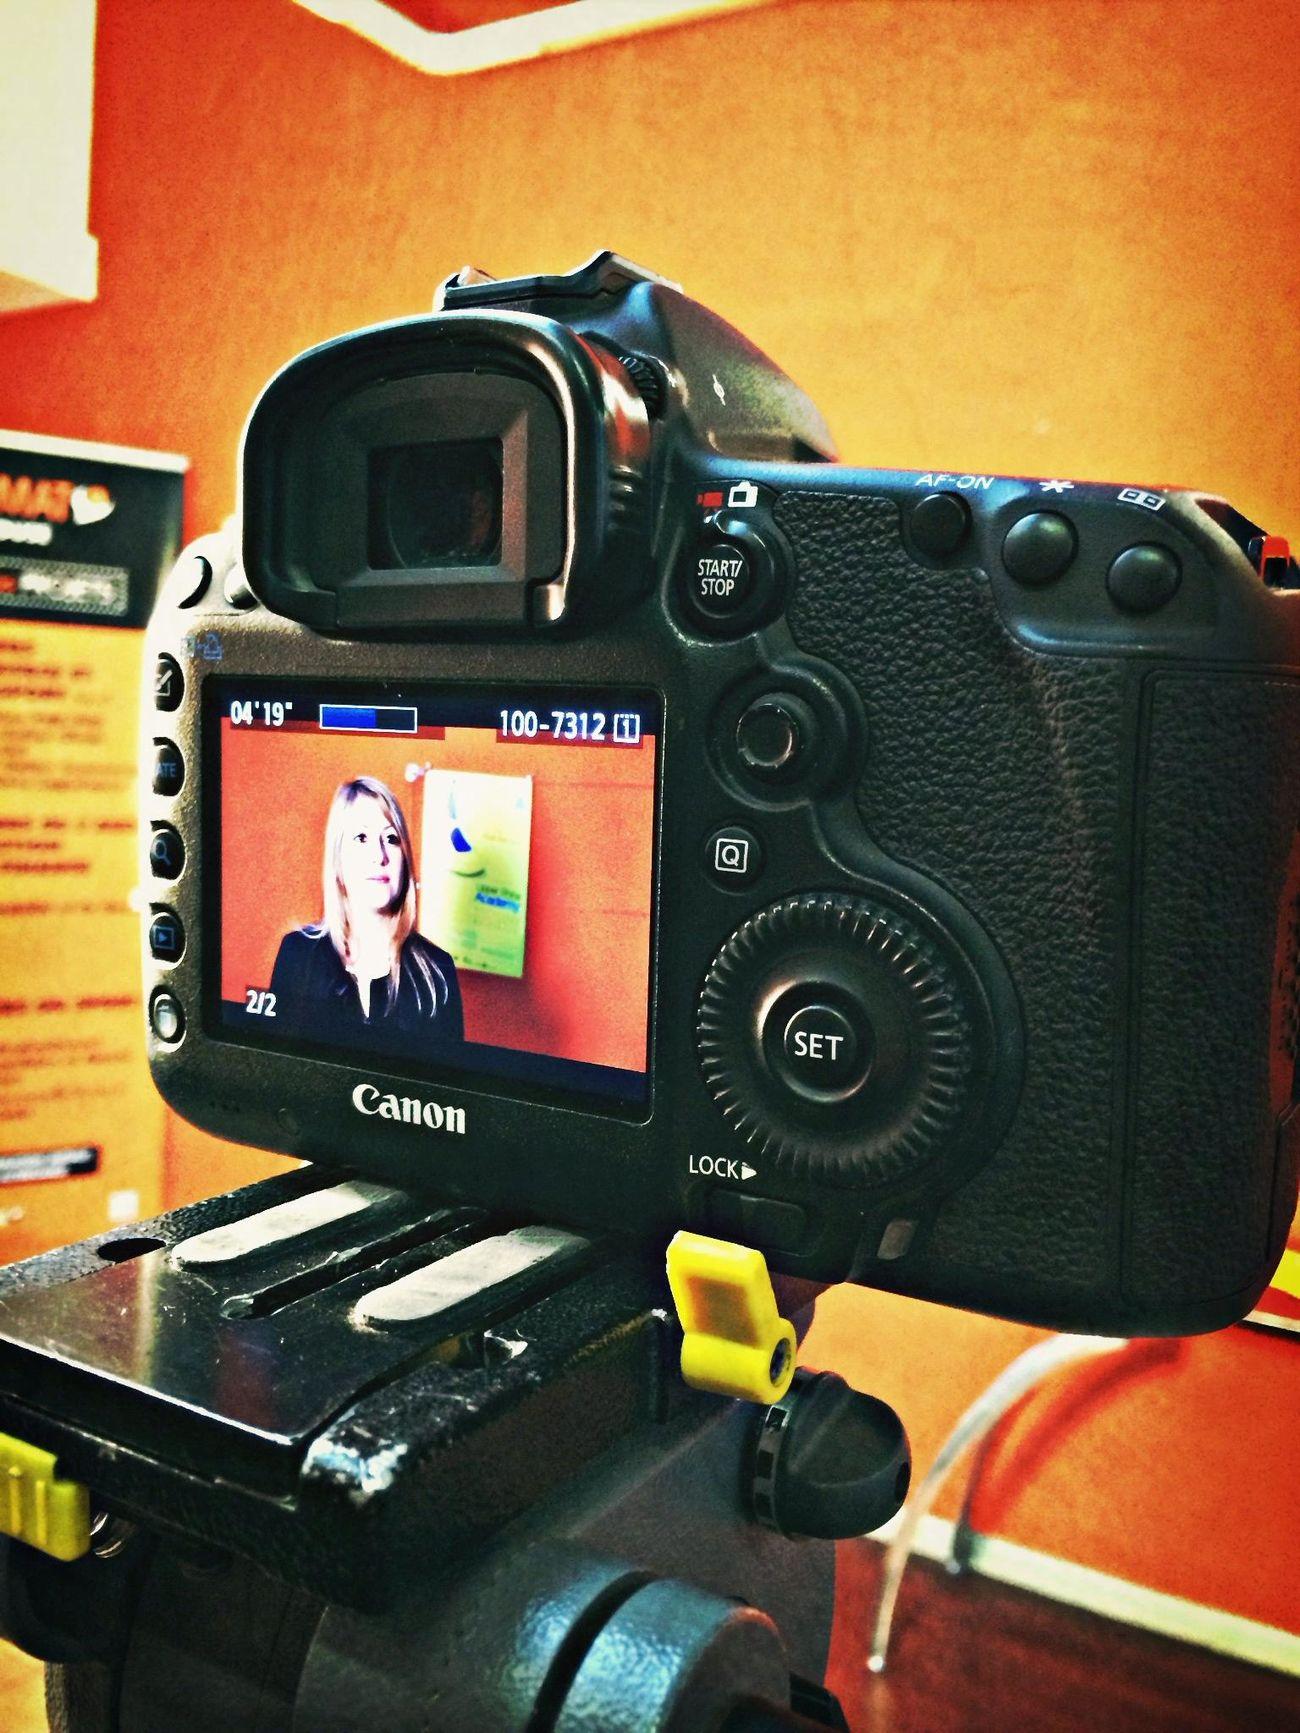 tournage !!!